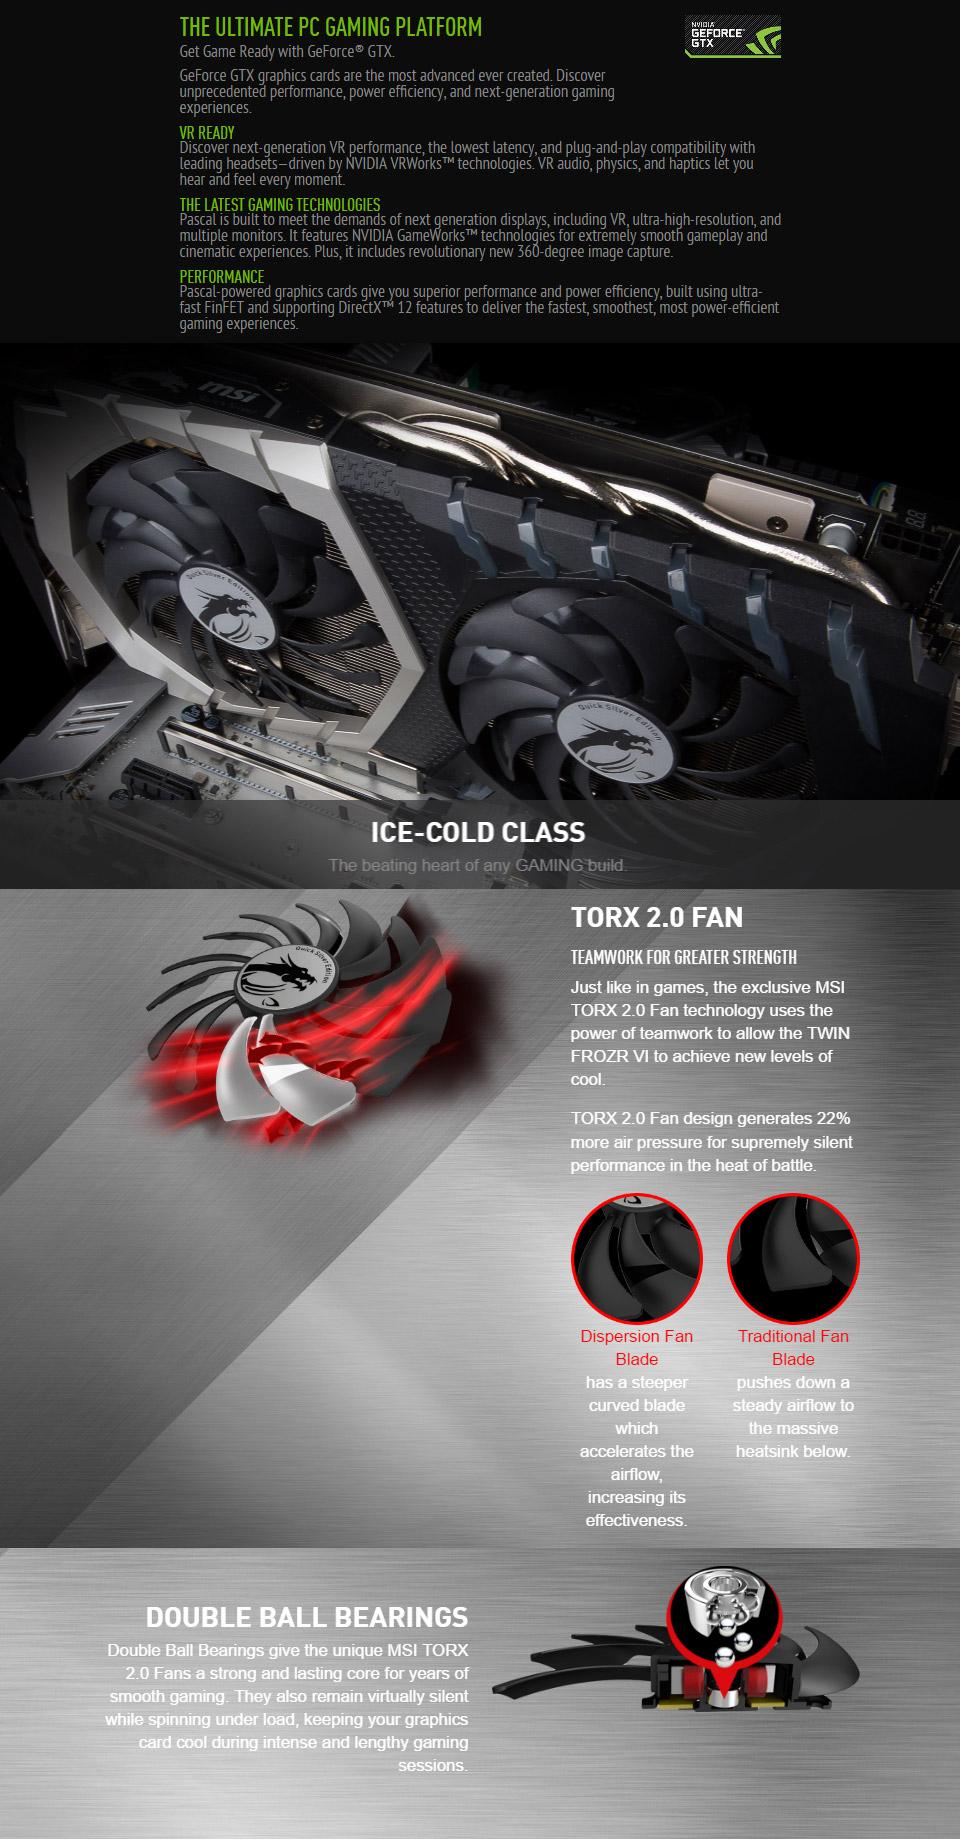 MSI GeForce GTX 1070 Quick Silver 8GB [MSI-GTX1070-QUICKSILVER-8GB